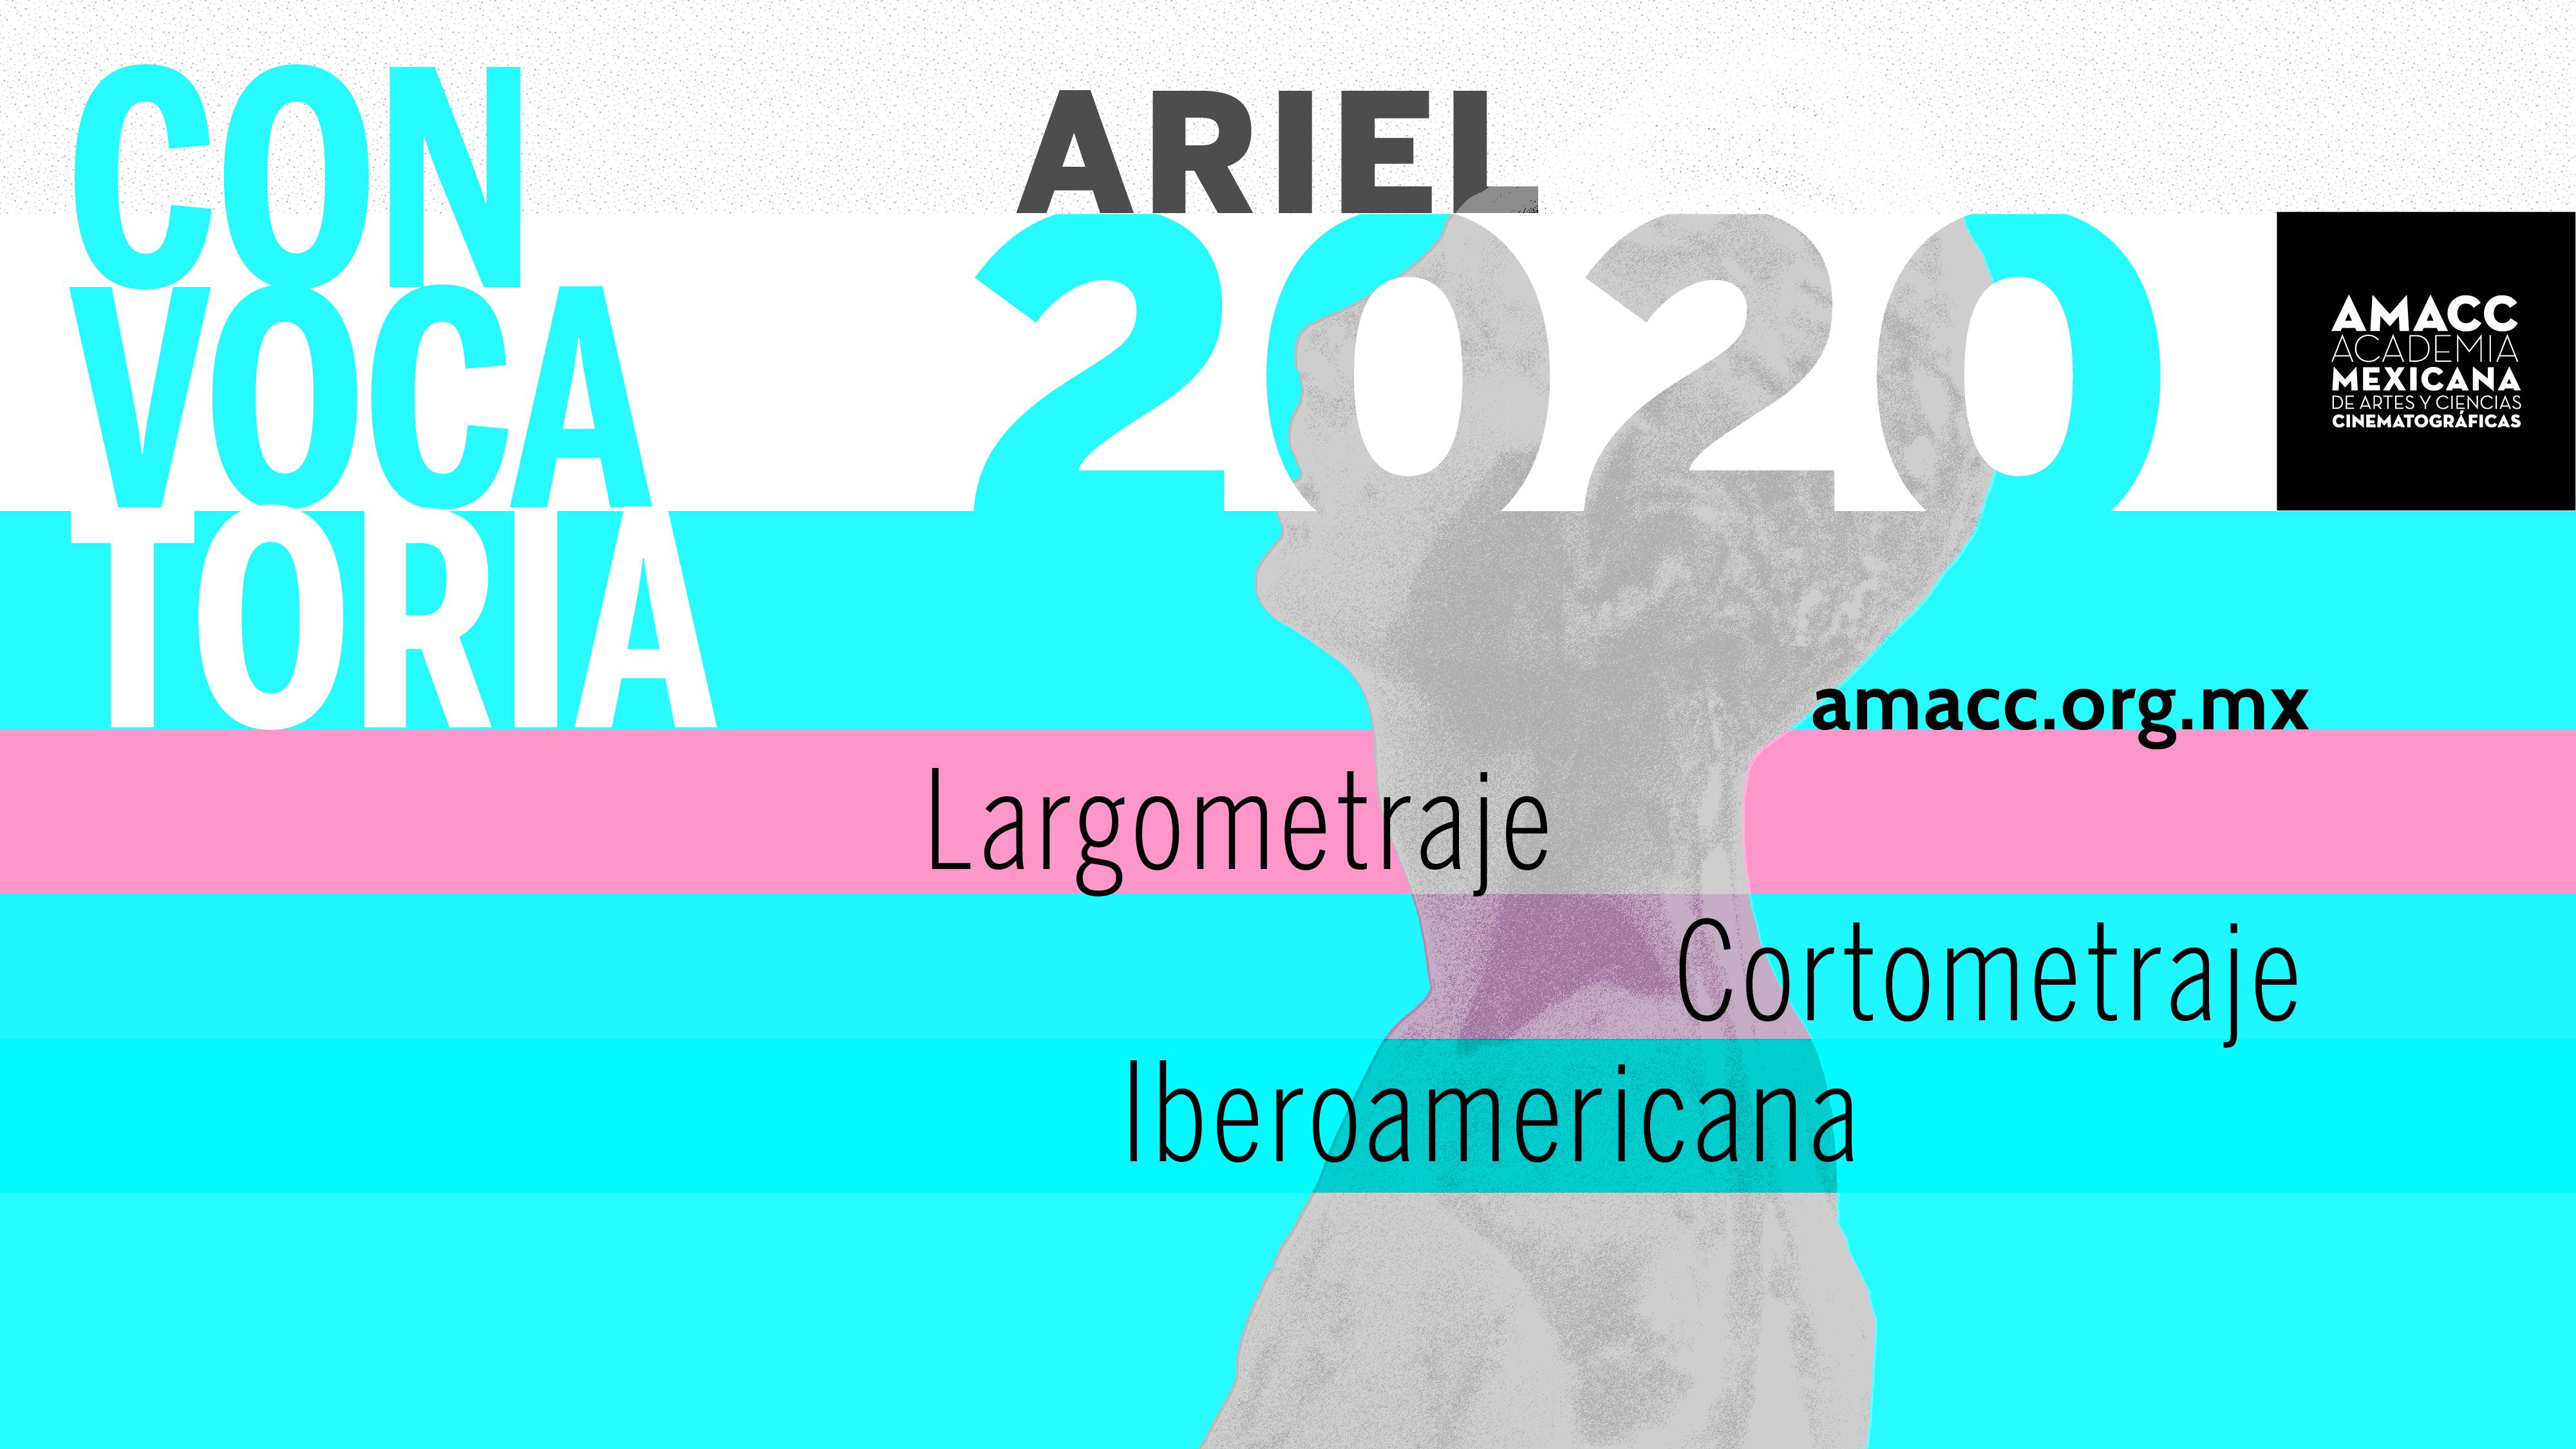 Convocatoria Ariel 2020